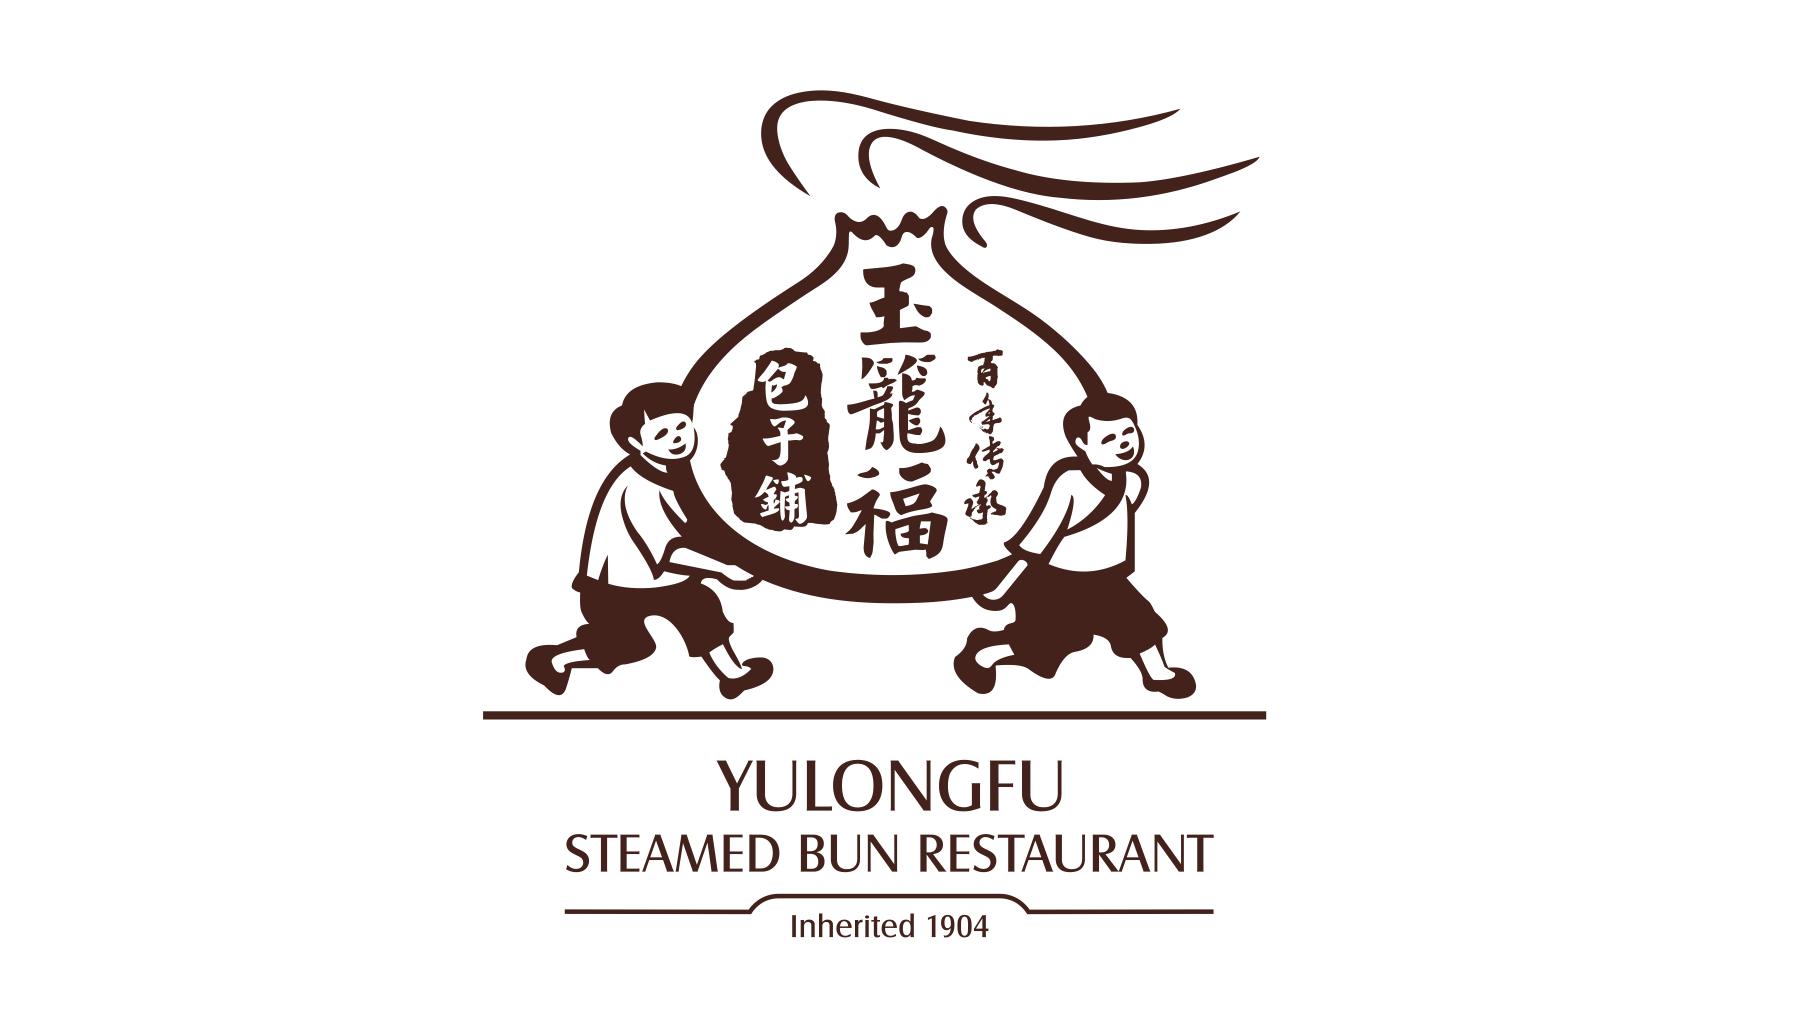 Yulongfu Steamed Bun logo